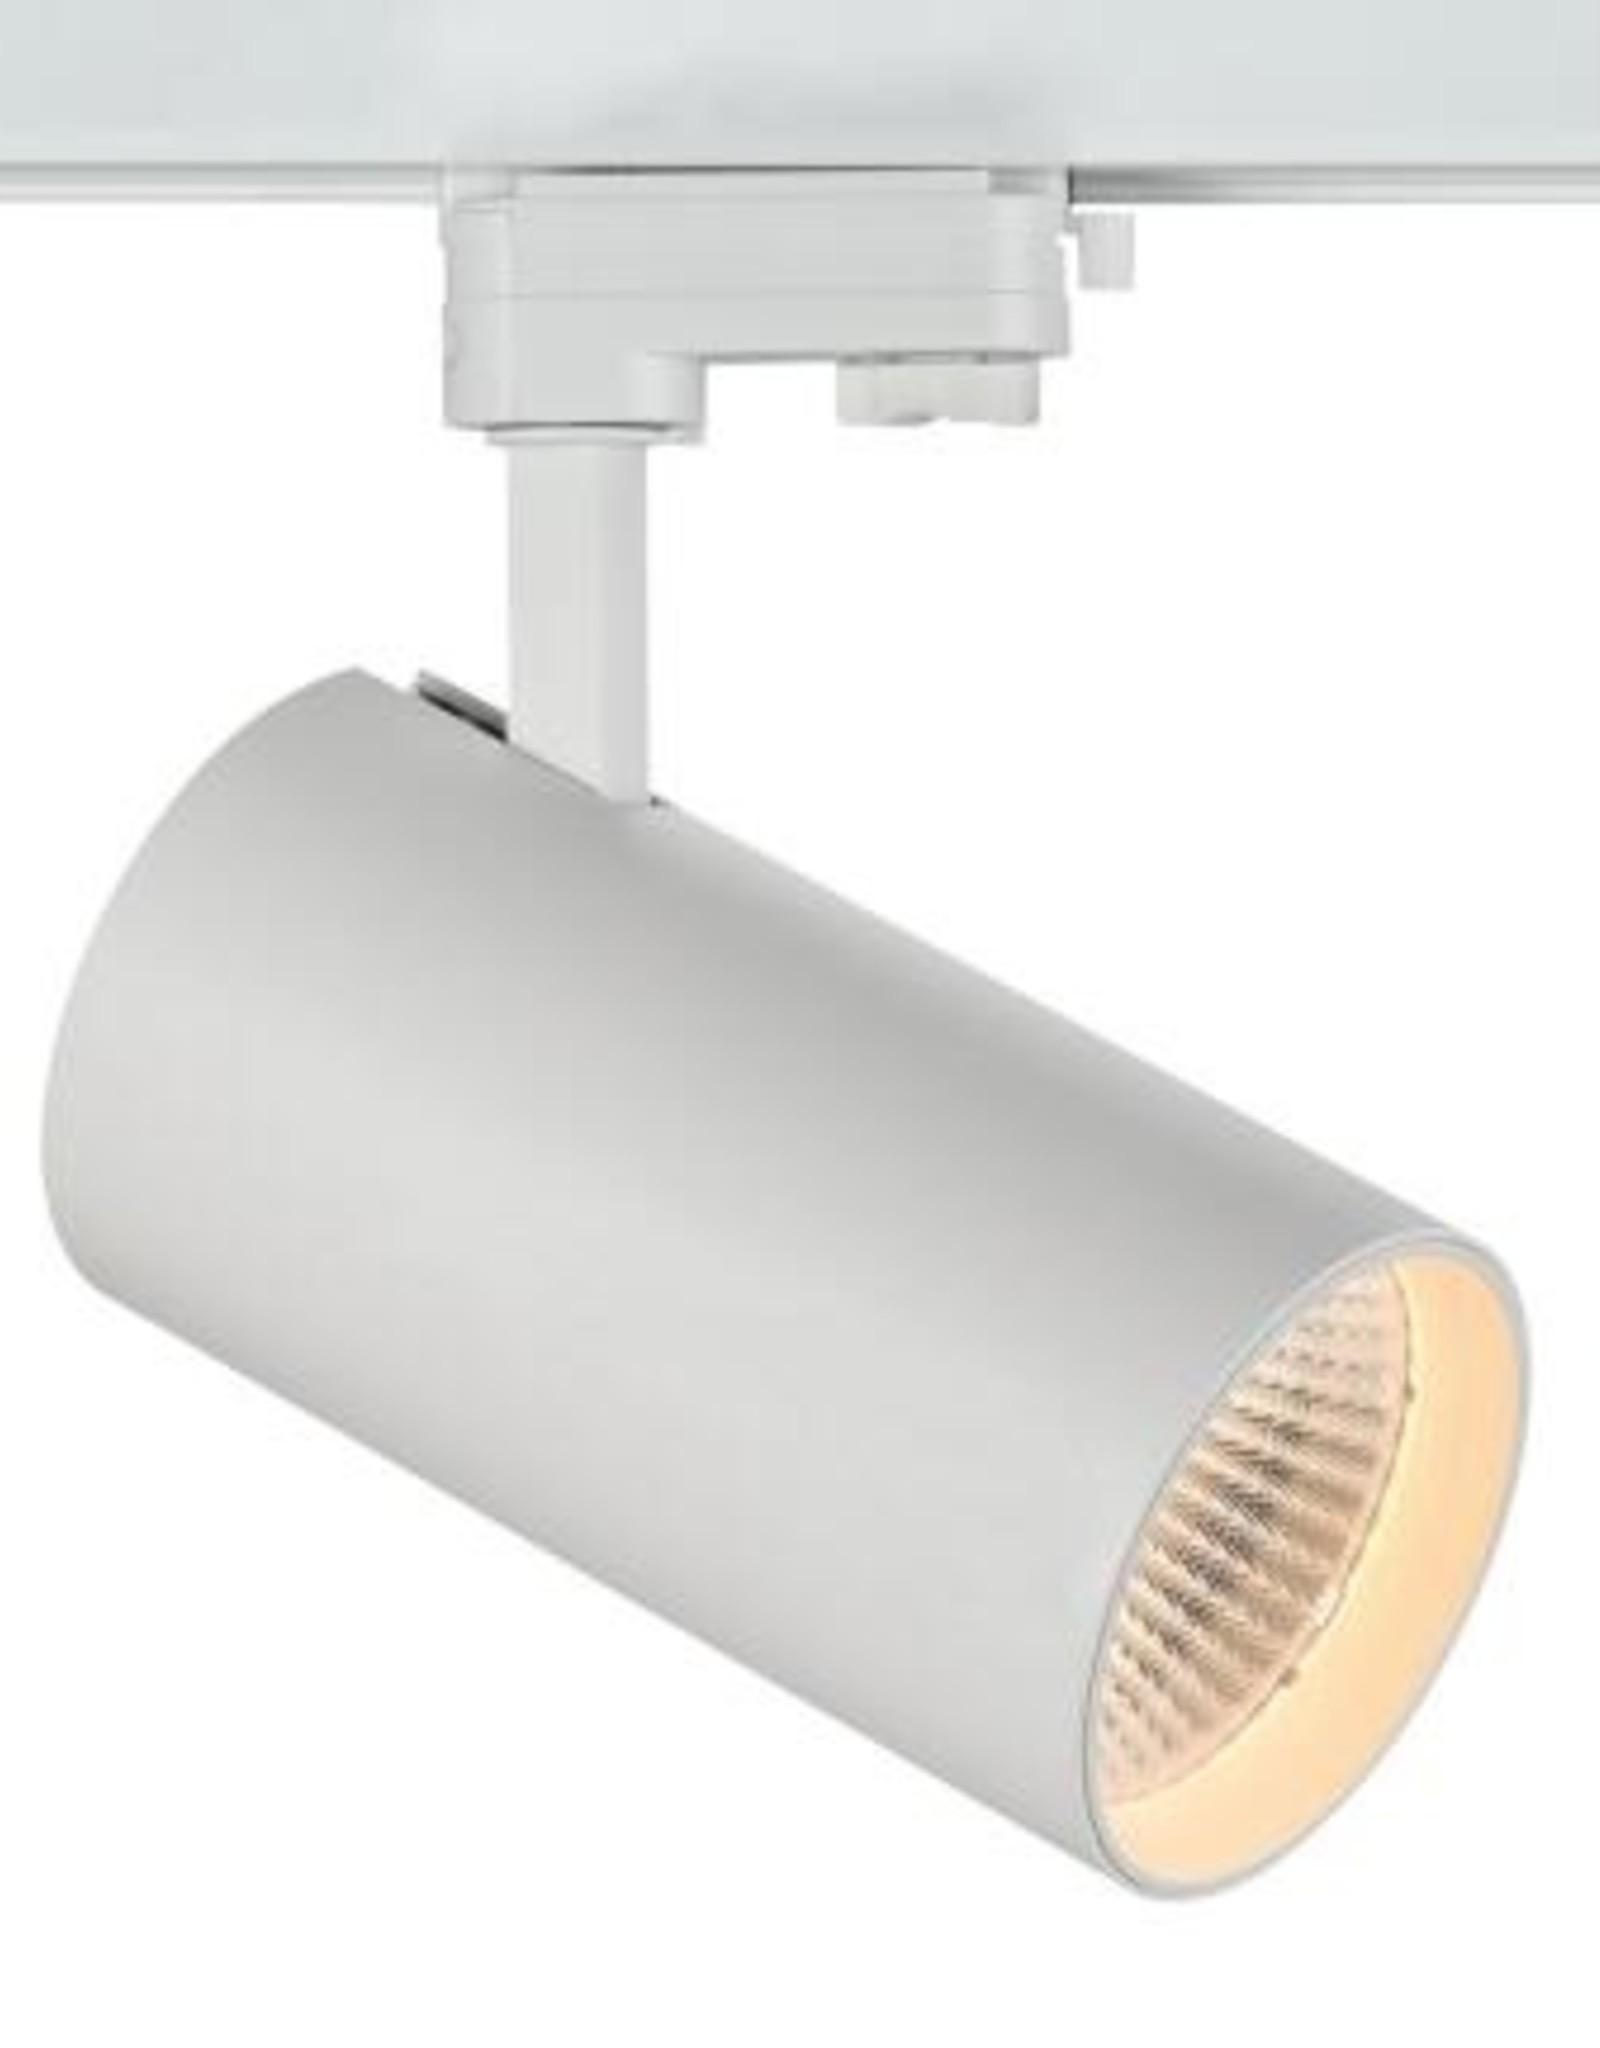 LedLed LED Tracklight 15W 2700k